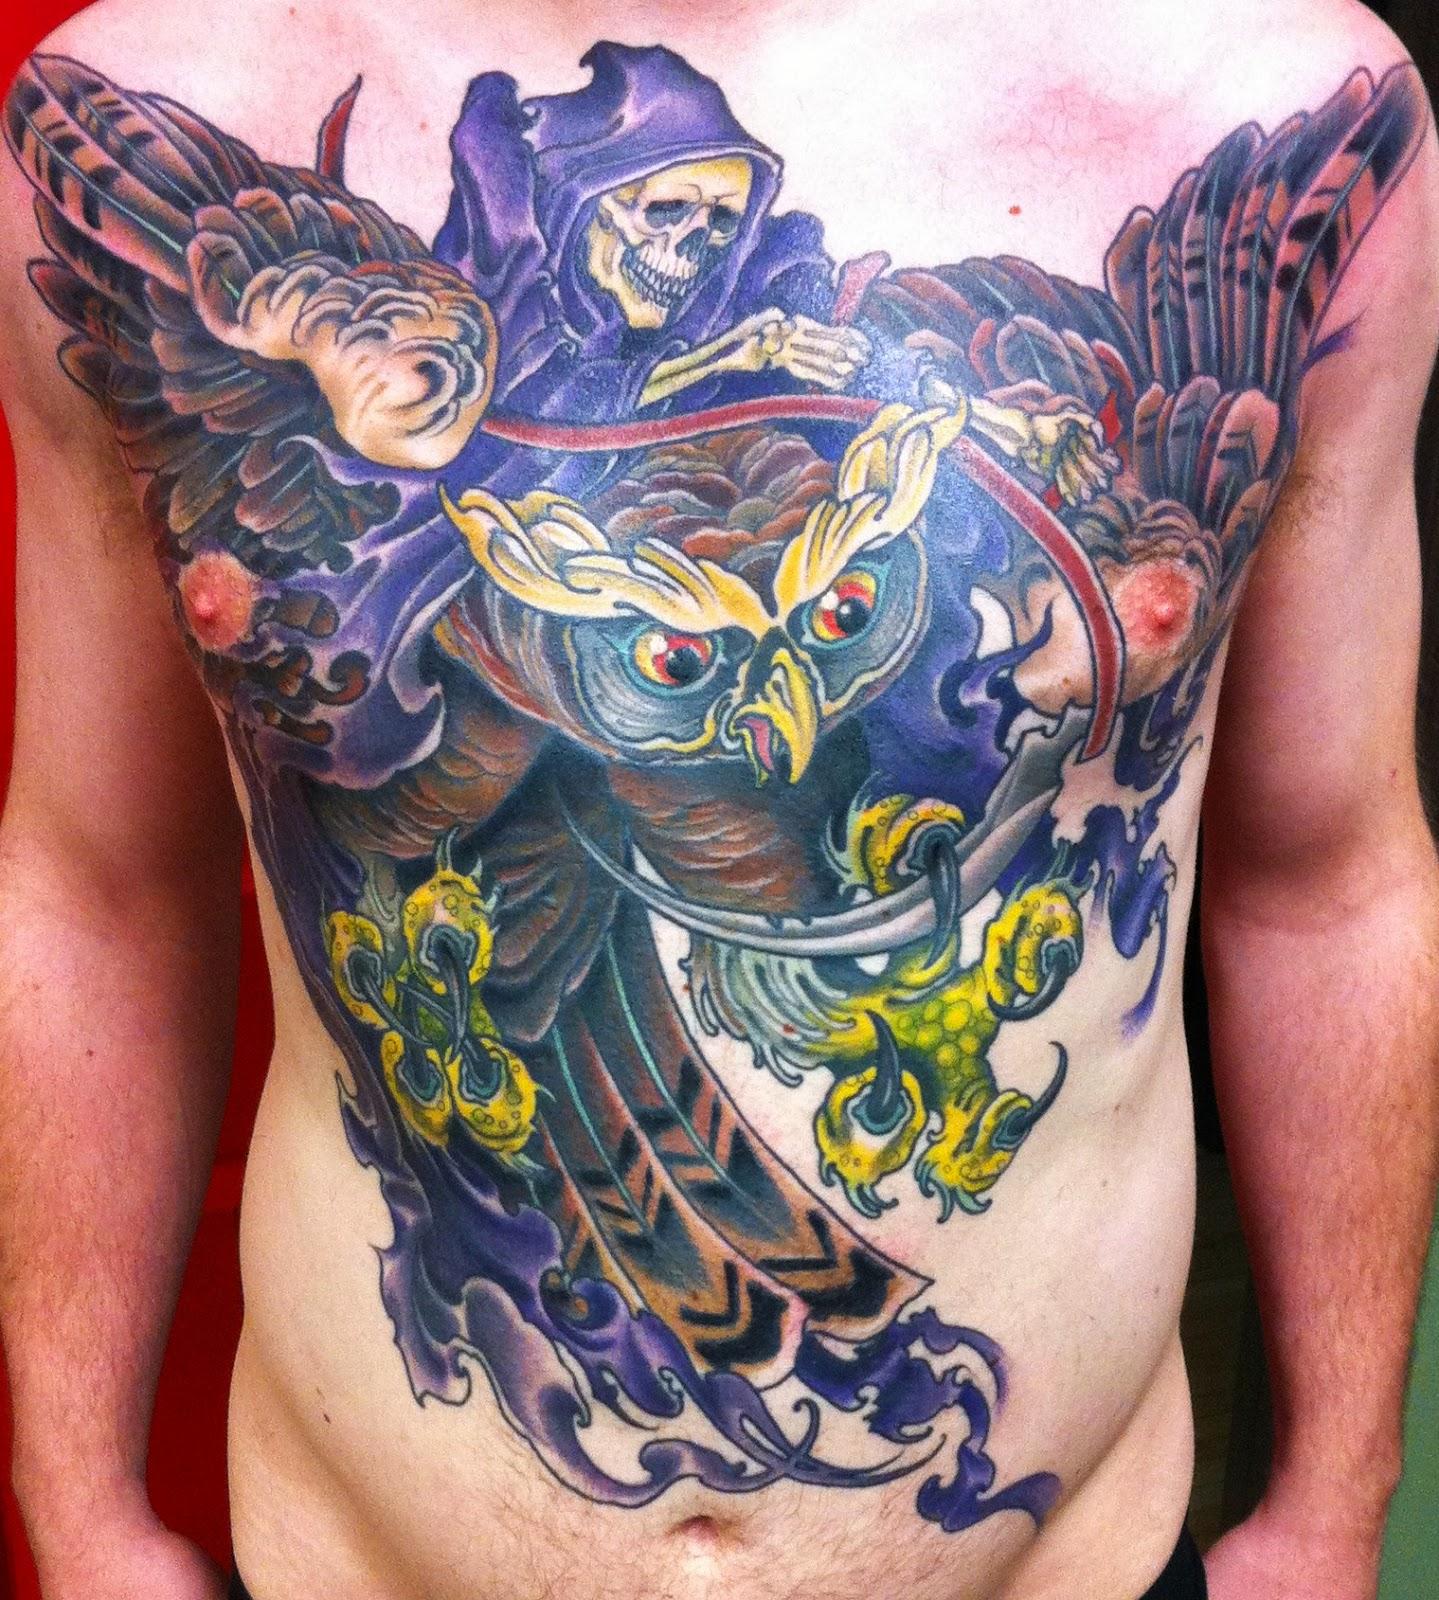 Tattoo Designs Grim Reaper: Great Grim Reaper Tattoo Ideas